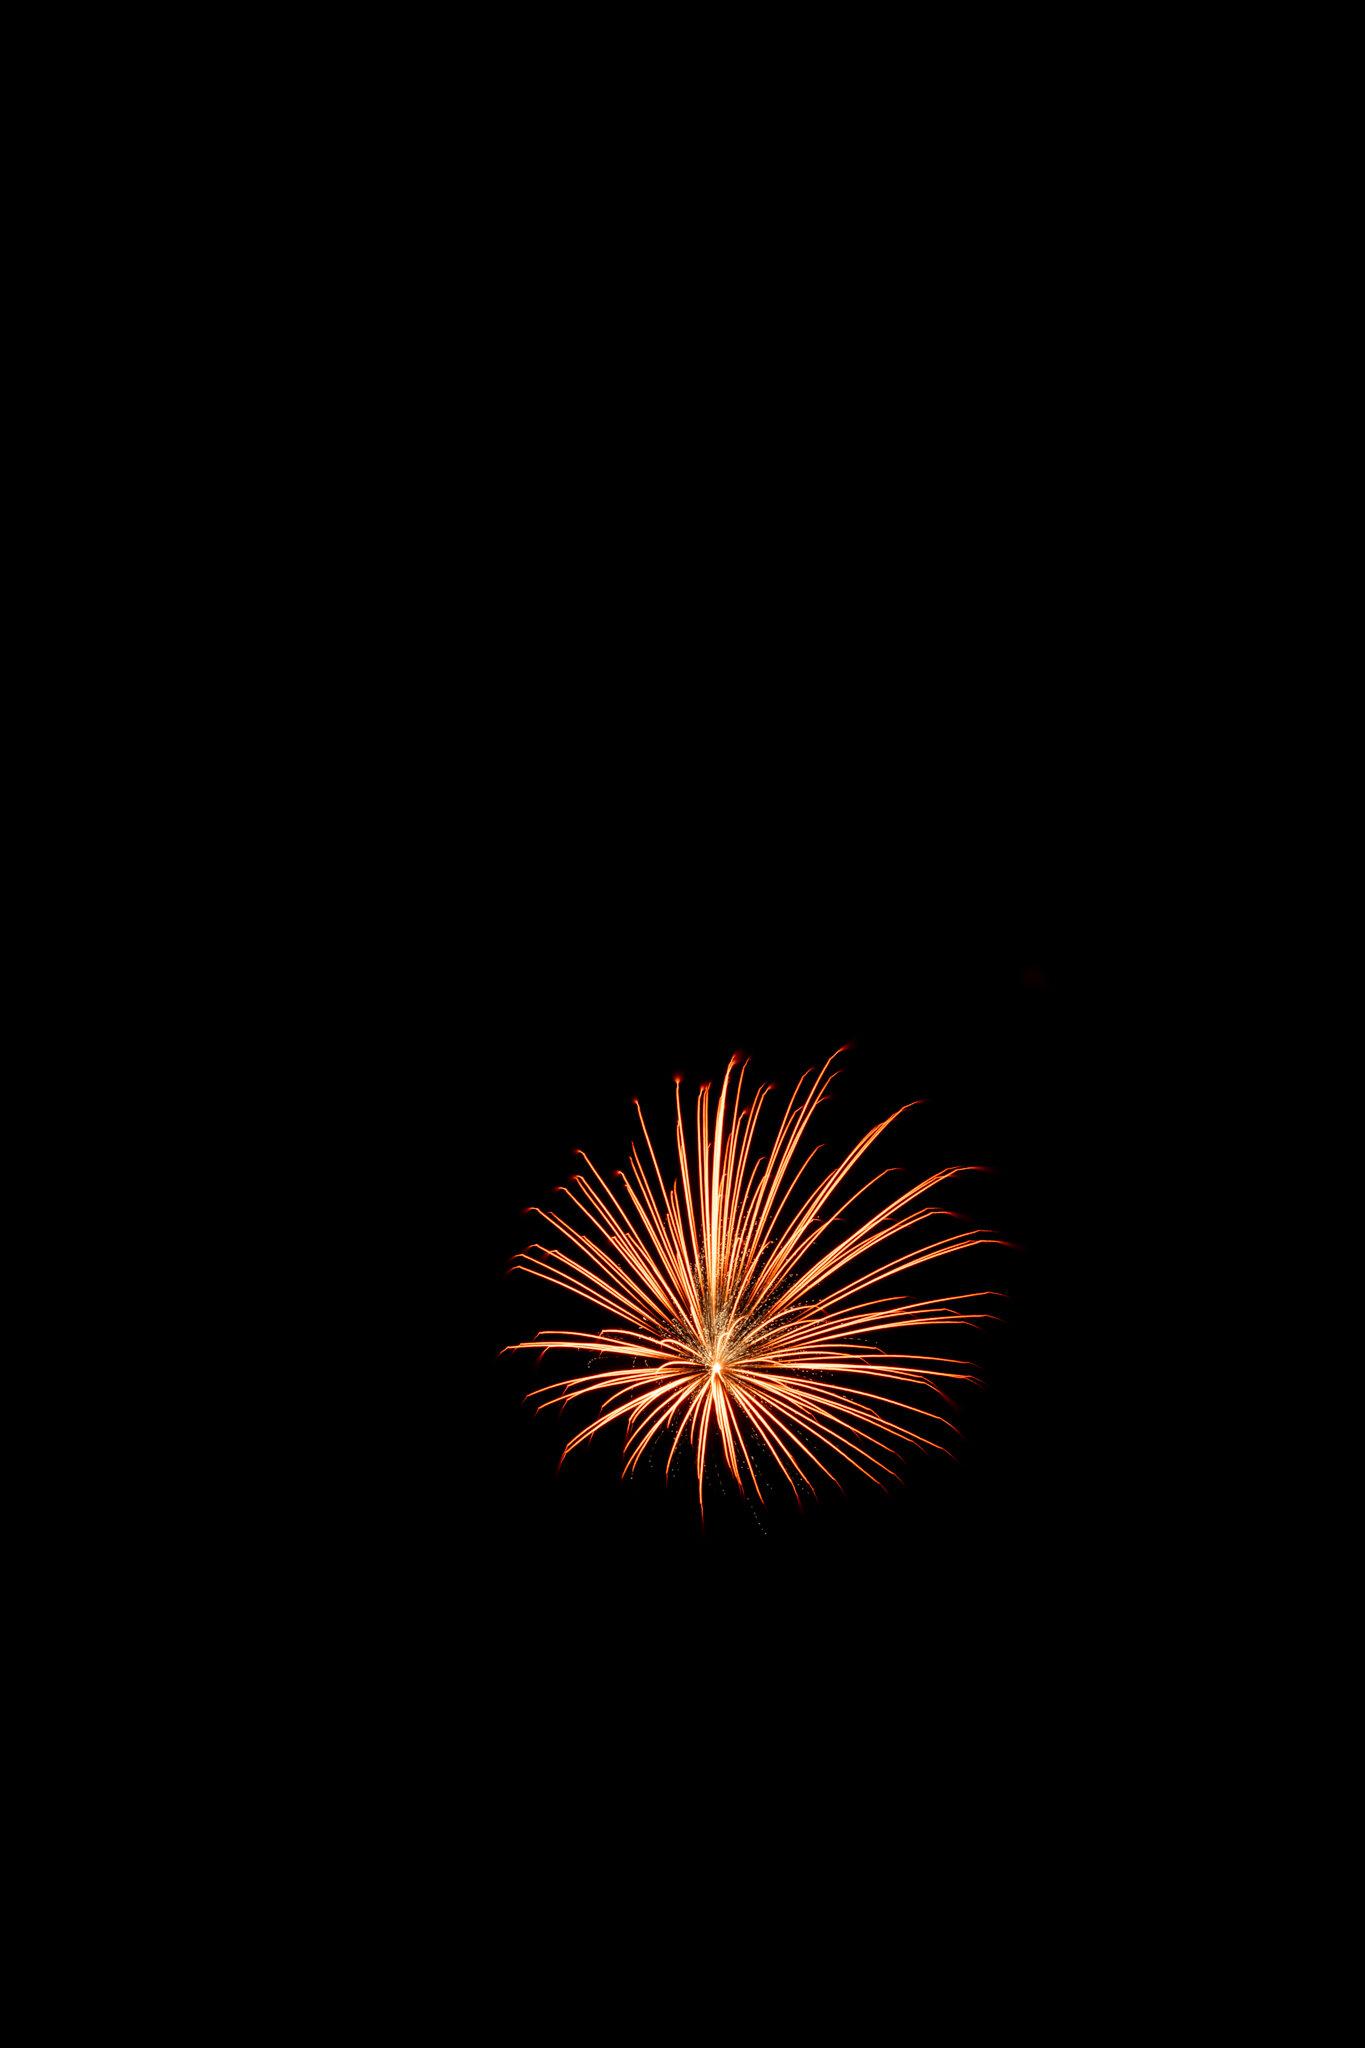 focuspulledfireworks-34.jpg